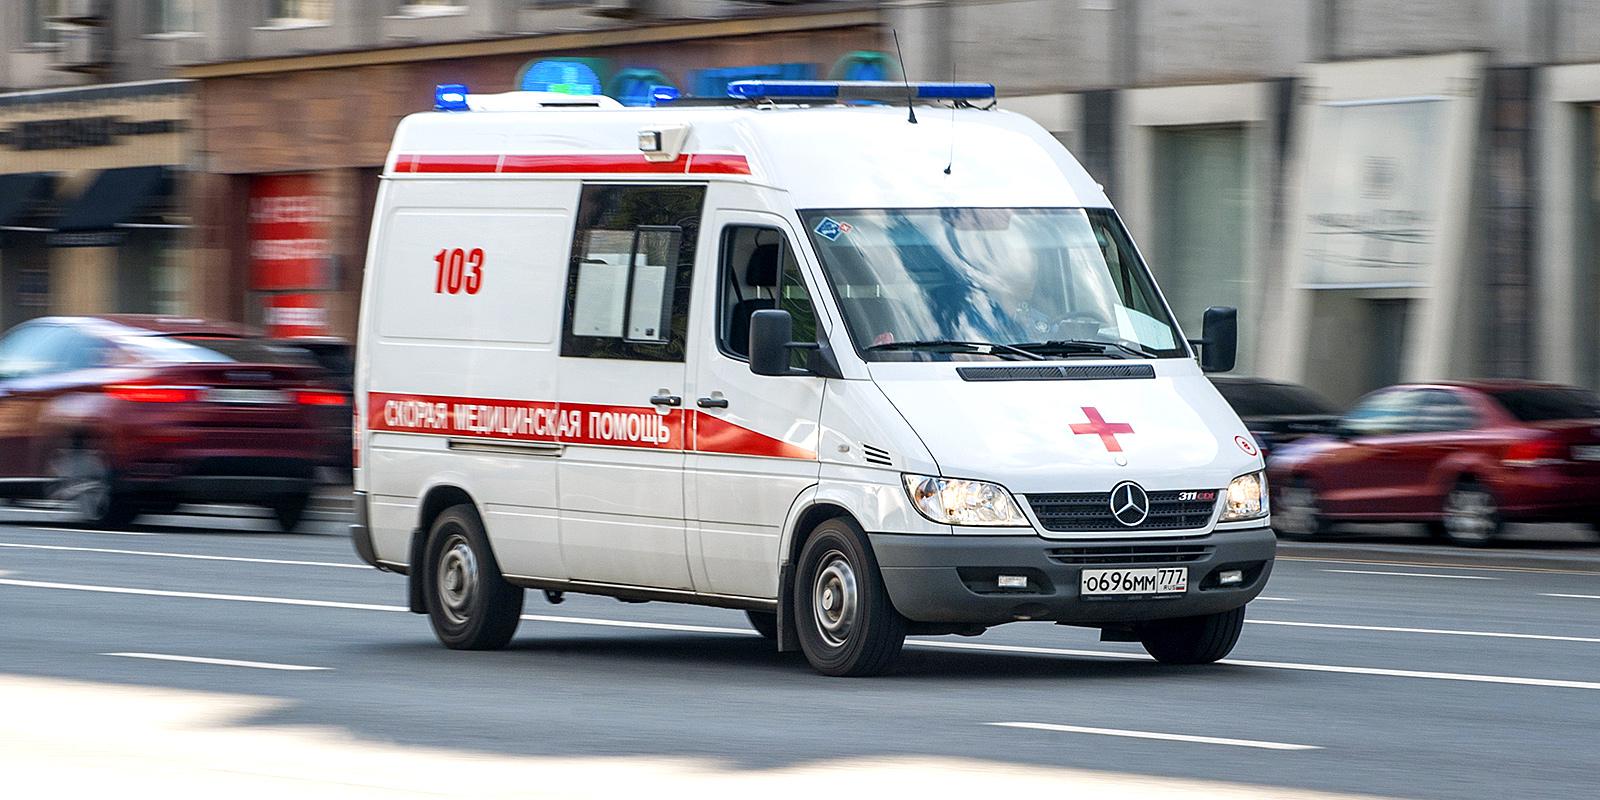 Родственники пациентки напали на бригаду «скорой» и повредили машину